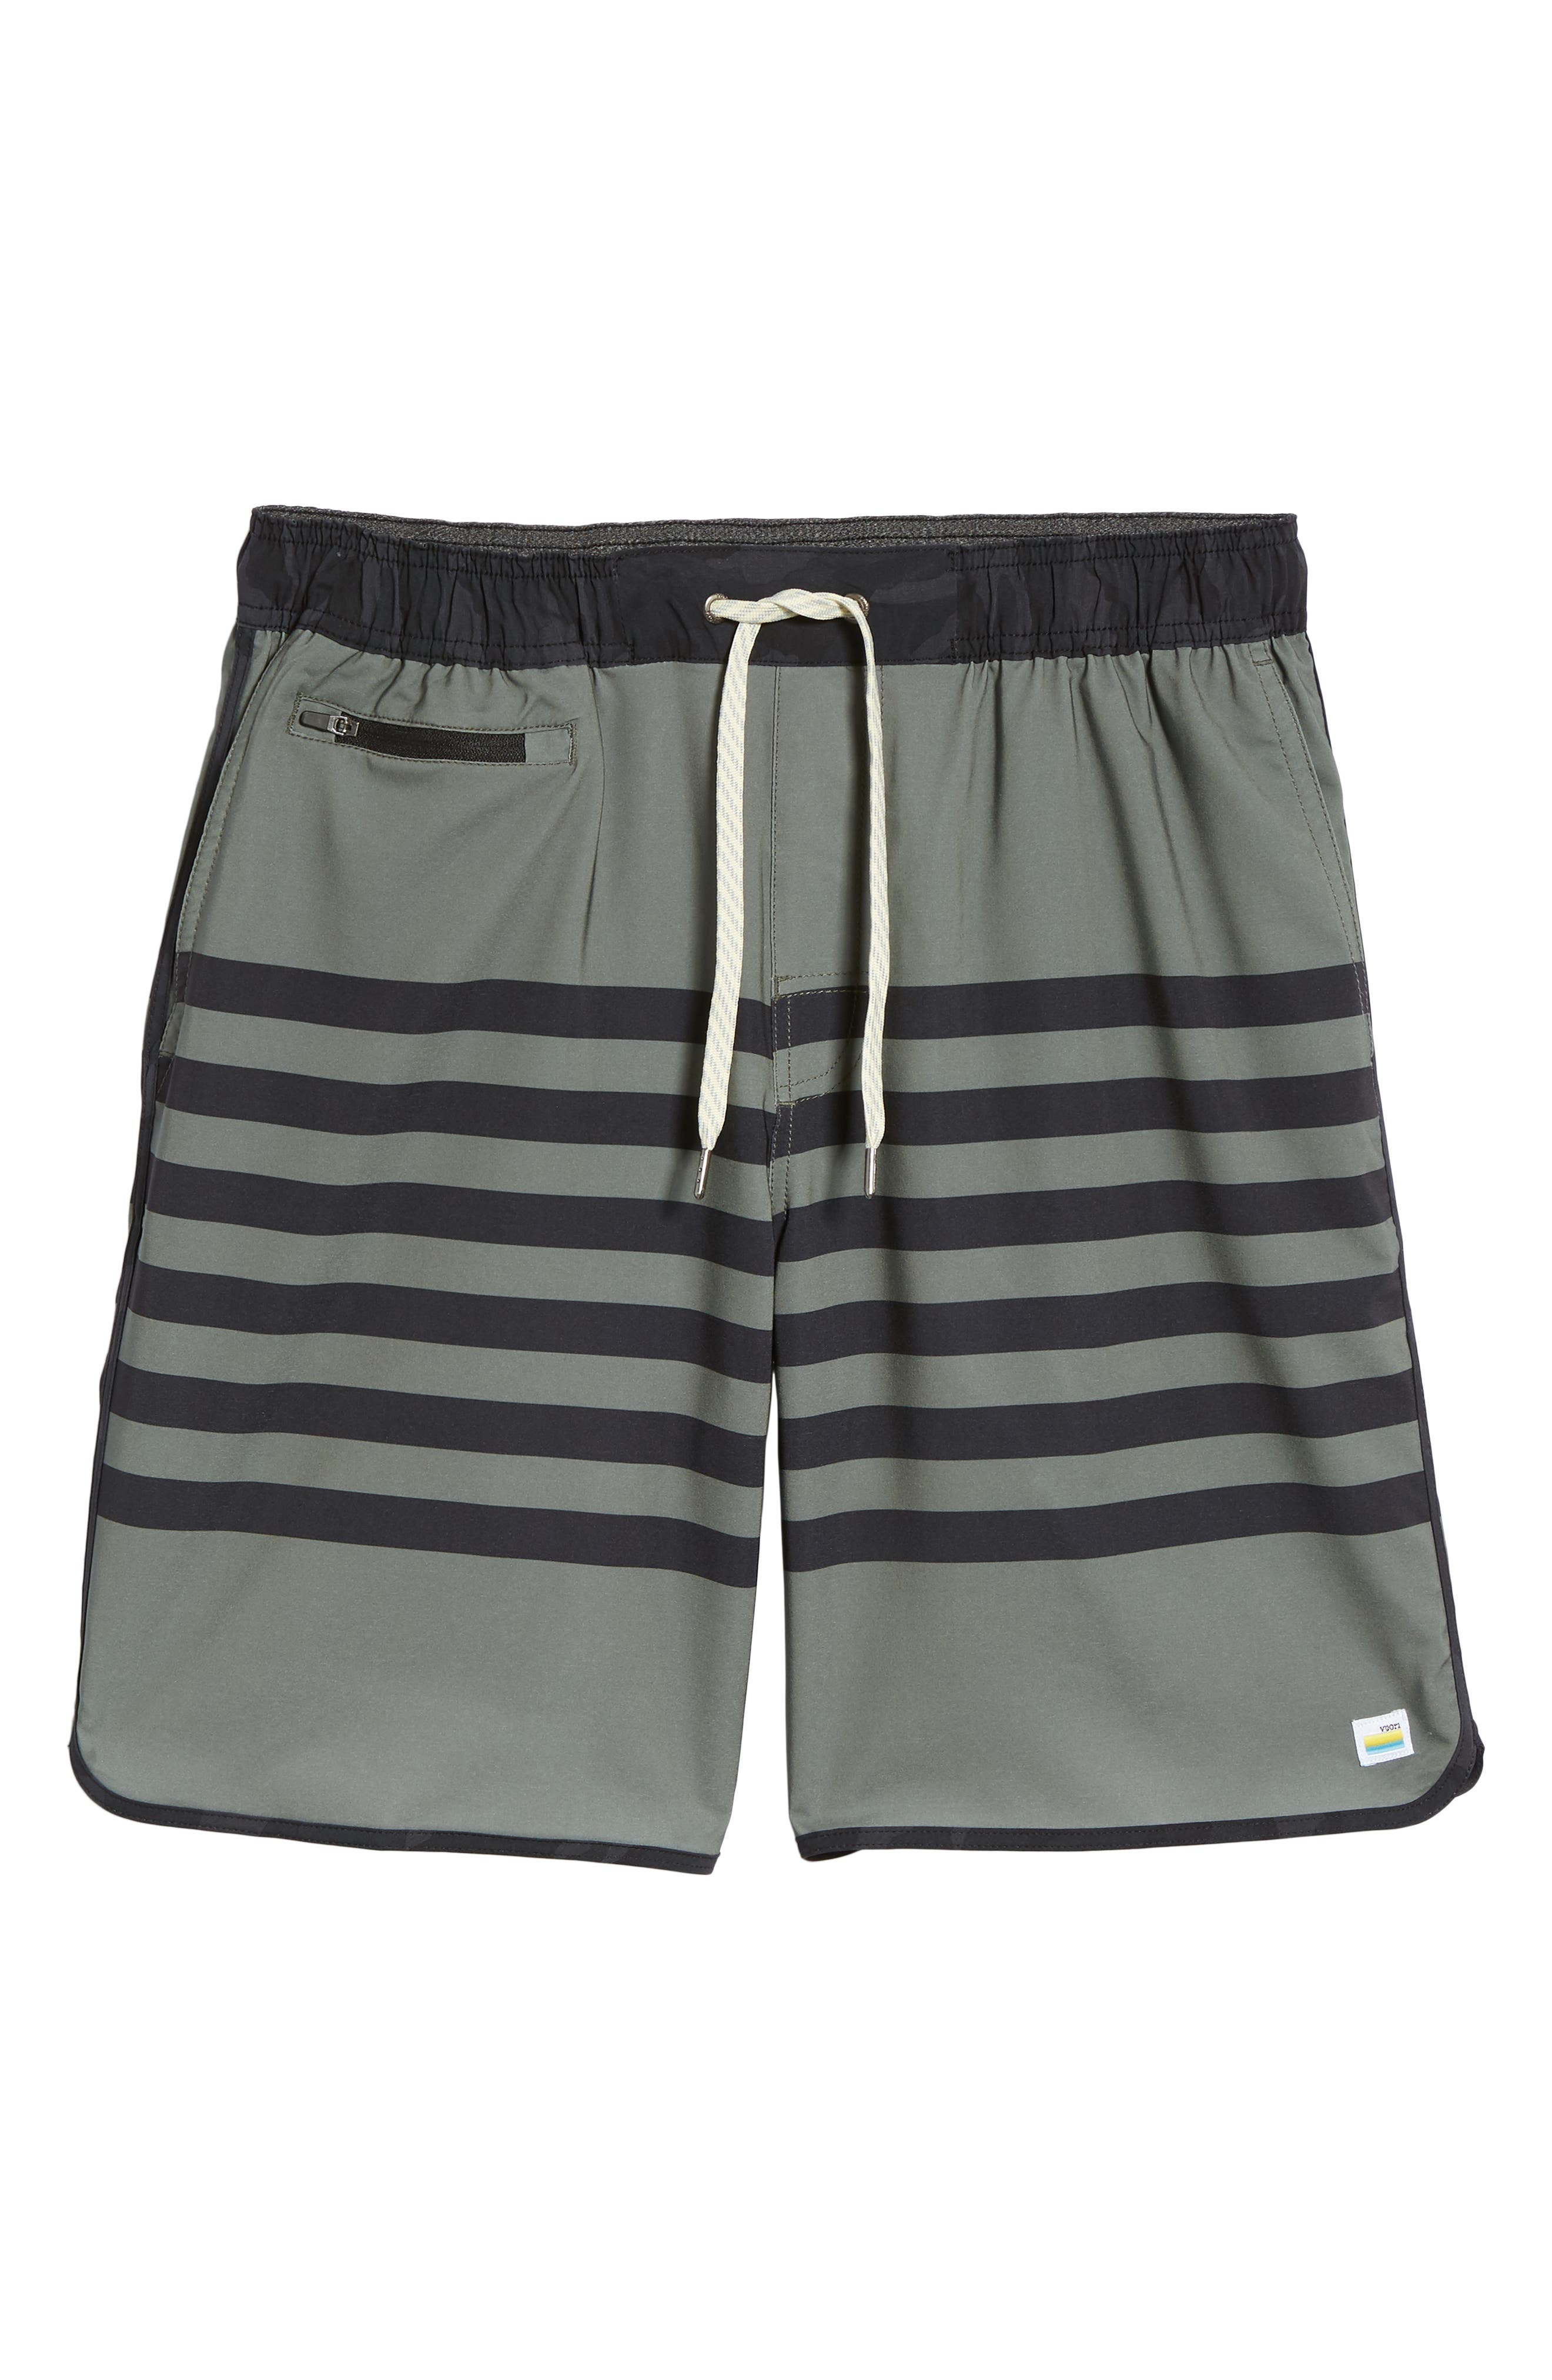 Banks Shorts,                             Alternate thumbnail 6, color,                             Army Stripe